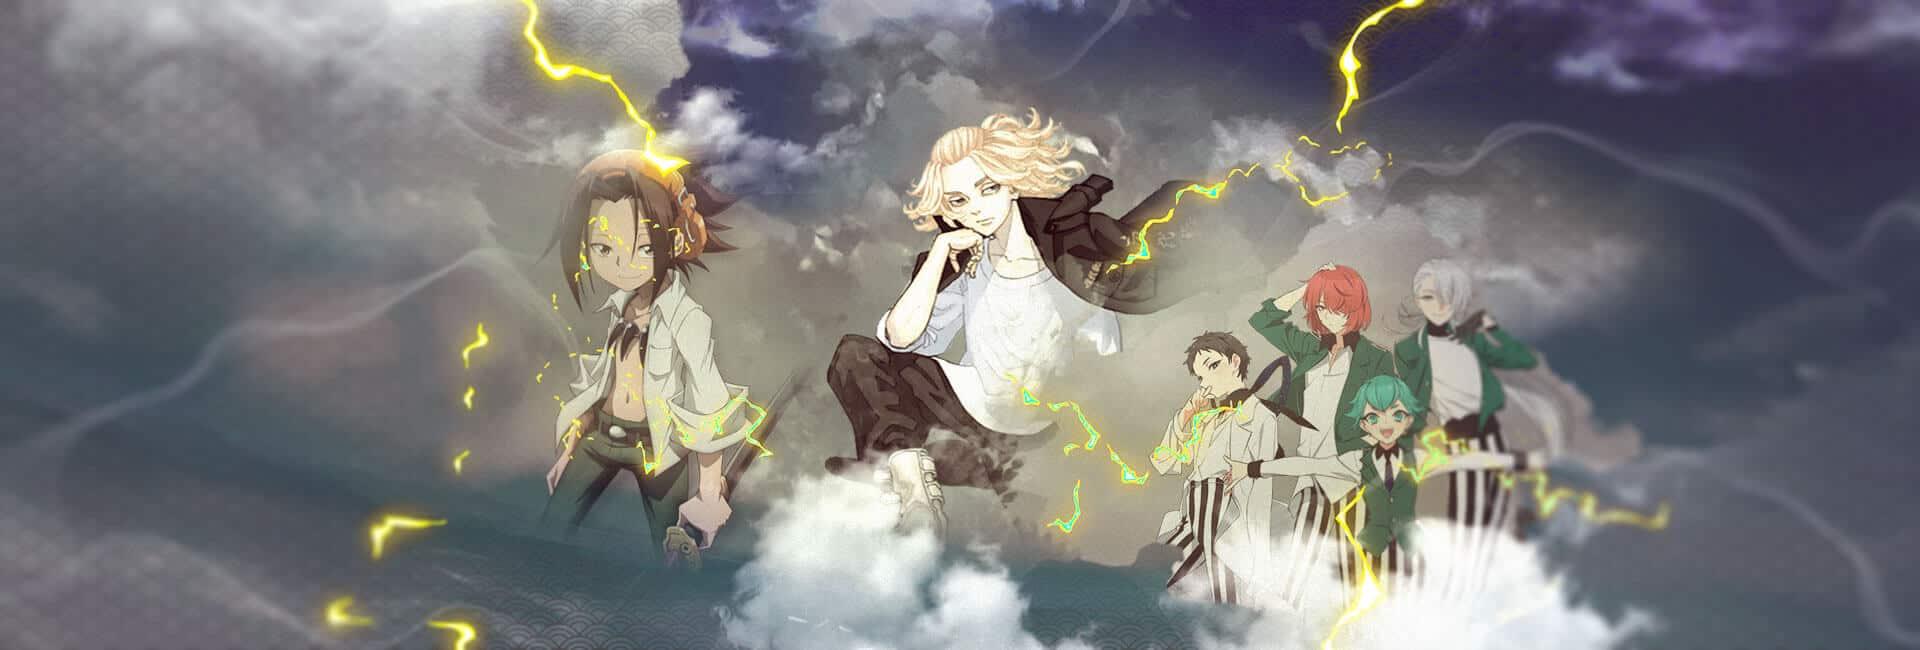 escolhas da temporada pela Cúpula - Shaman King, Tokyo Revengers, Bishounen Tanteidan